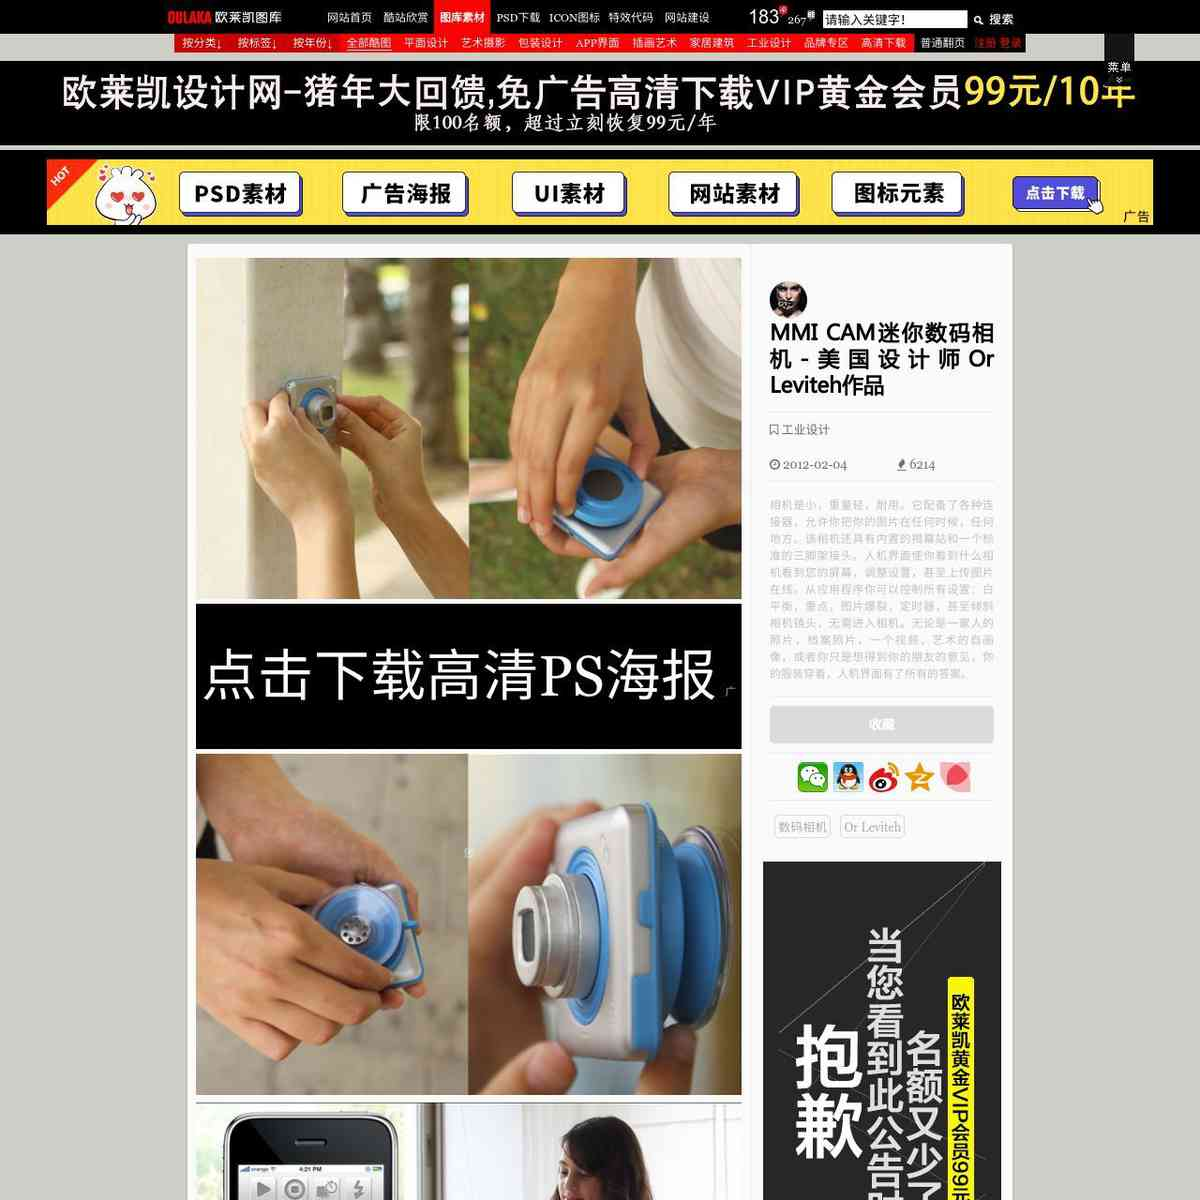 abc.2008php.com/Design_news.php?id=908576&topy=12